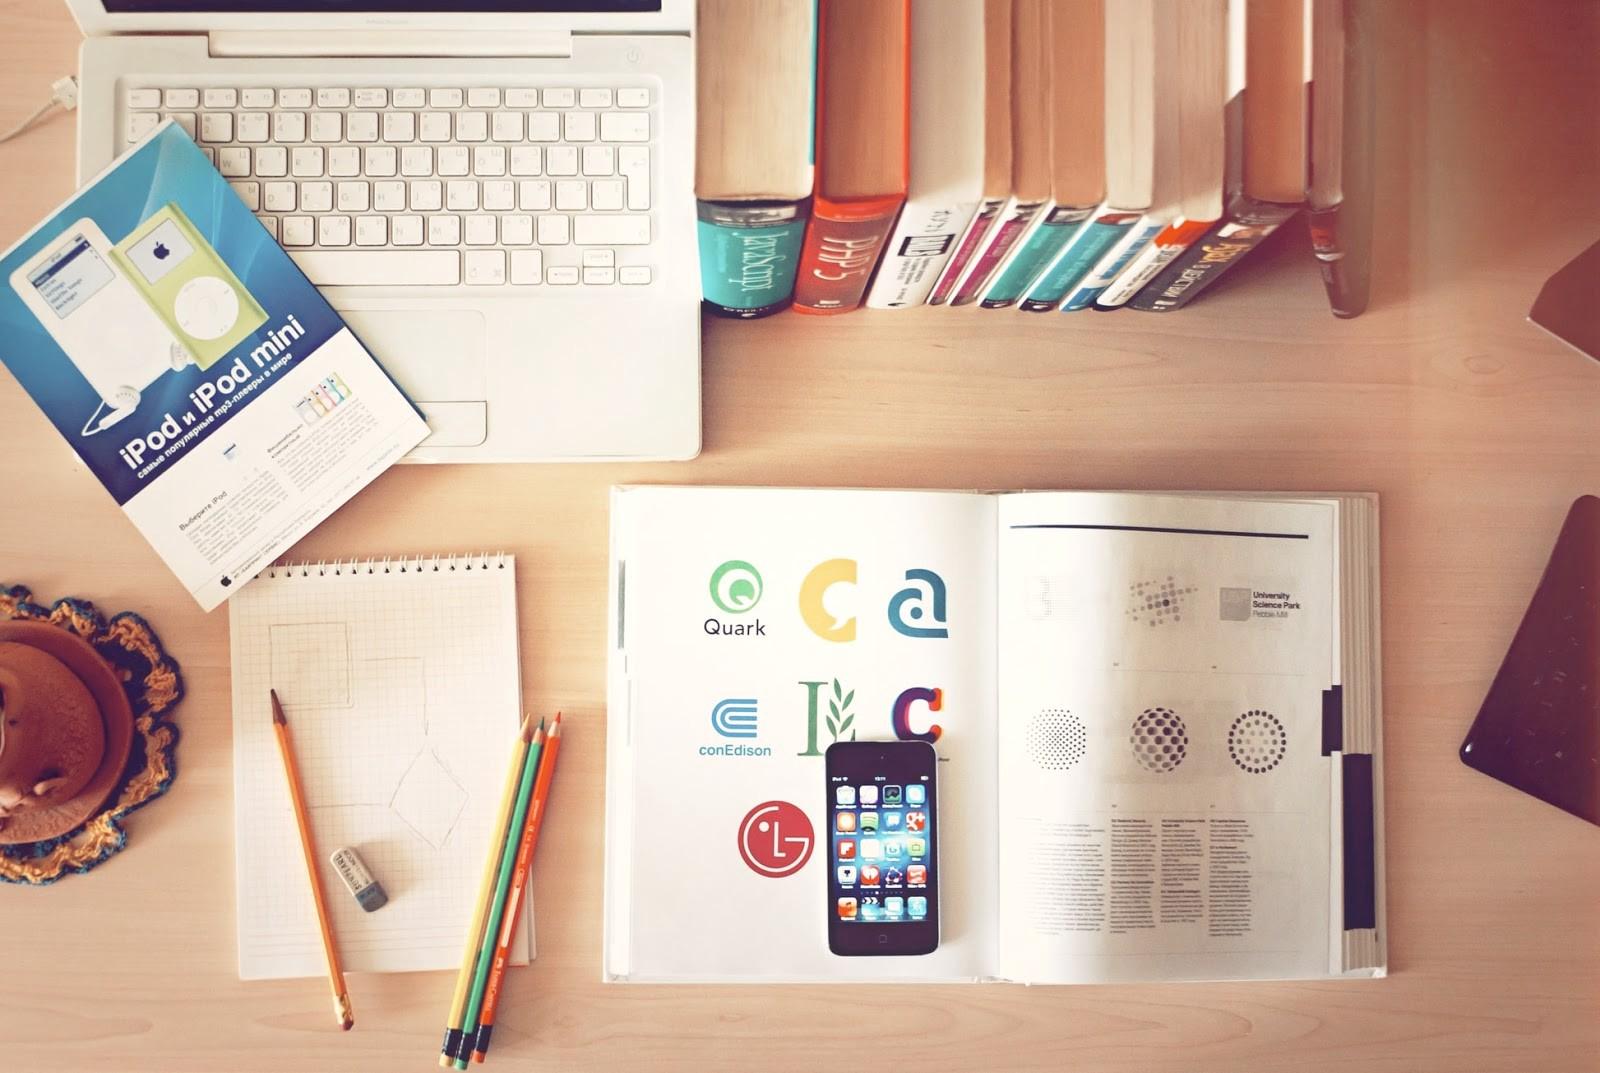 2020: Web Design Trends